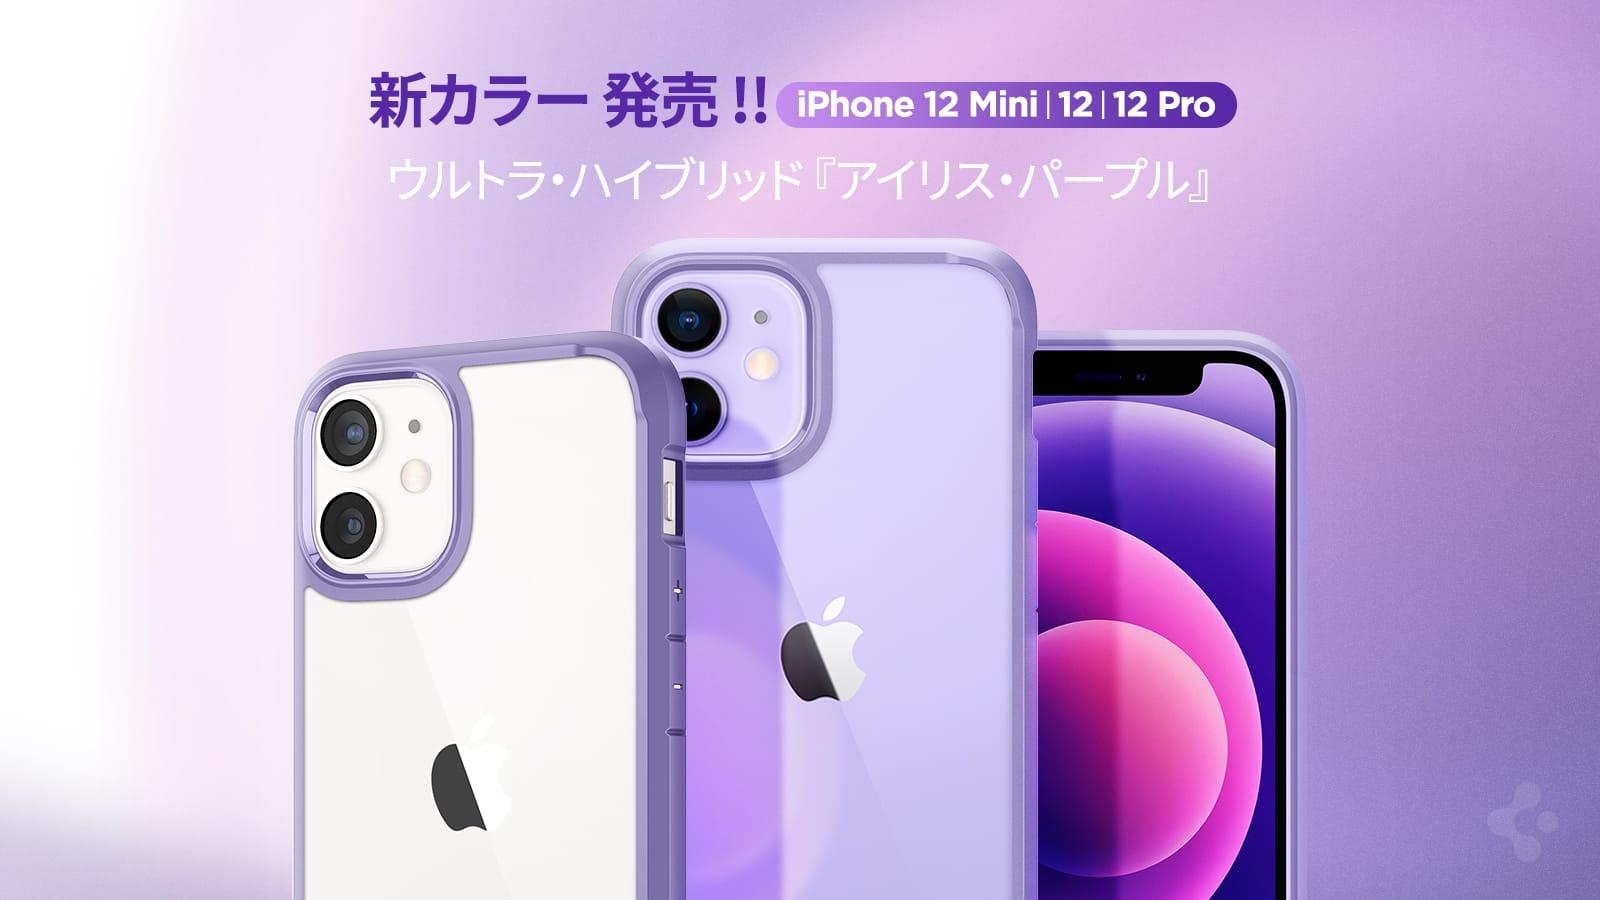 Spigen、iPhone 12/12 mini用耐衝撃ケースの新色アイリスパープル発売